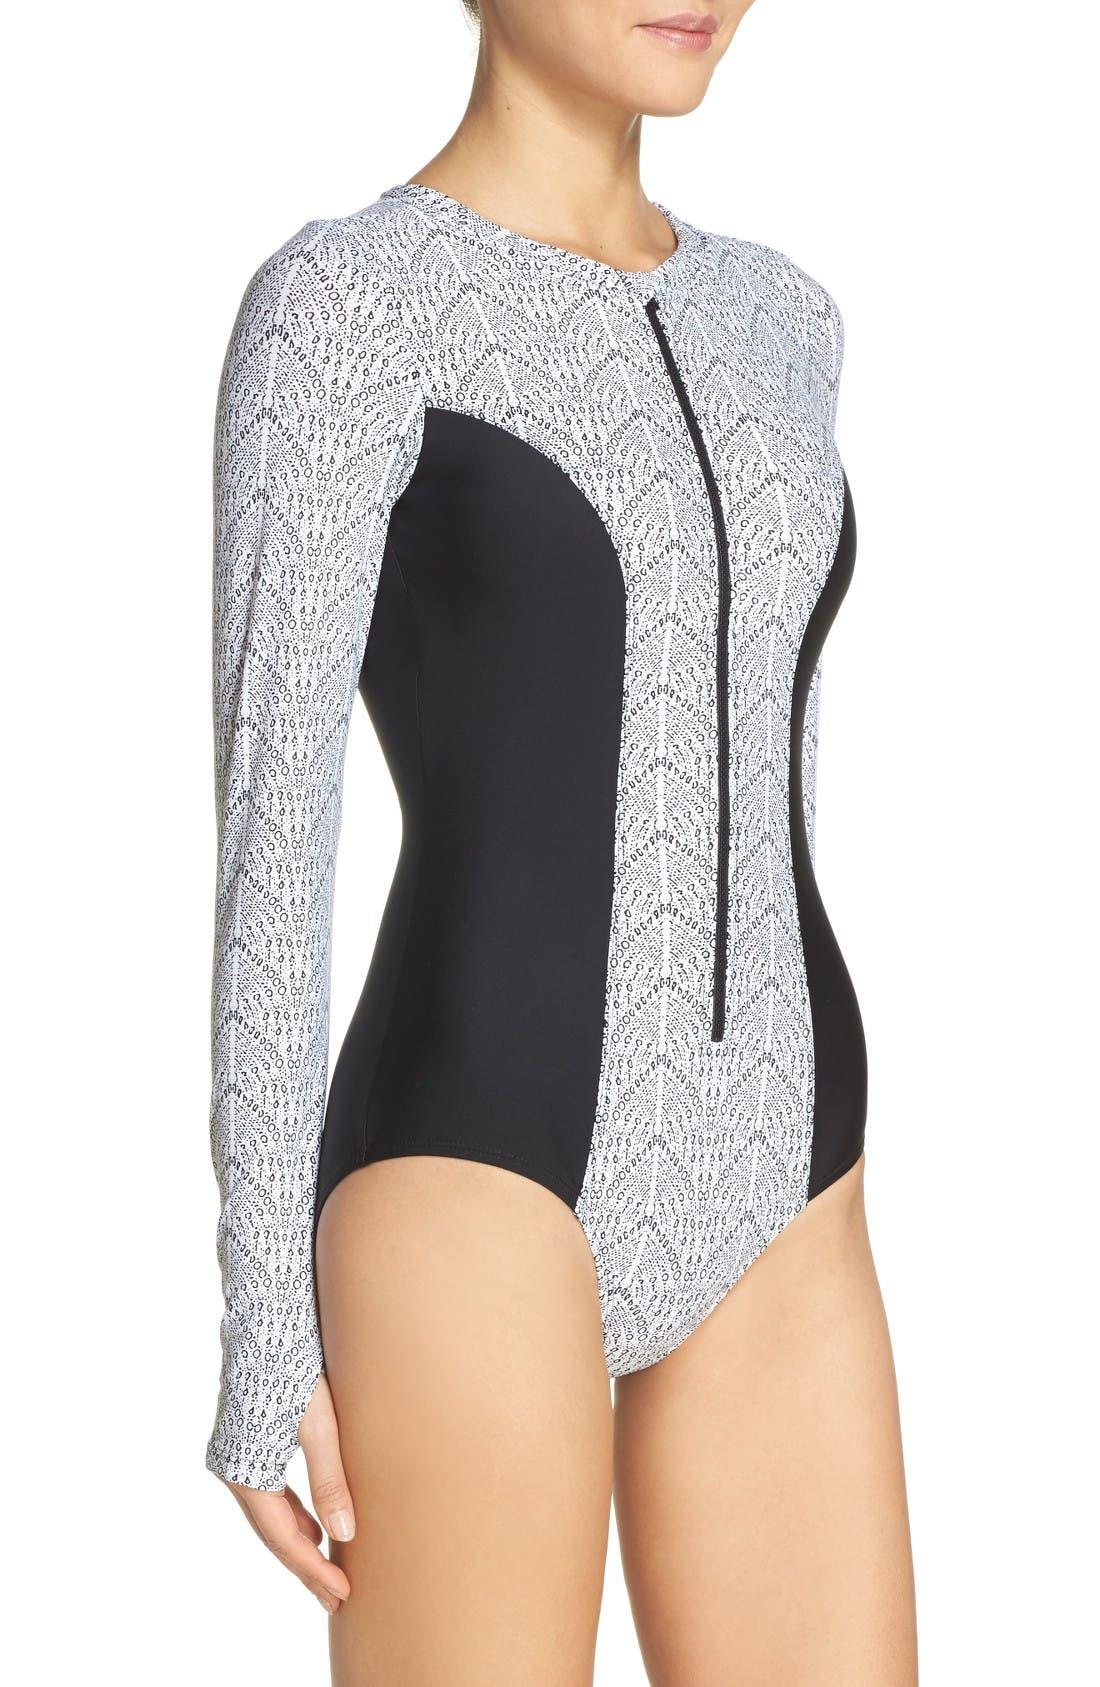 Long Sleeve One-Piece Swimsuit,                             Alternate thumbnail 3, color,                             Geo/ Black